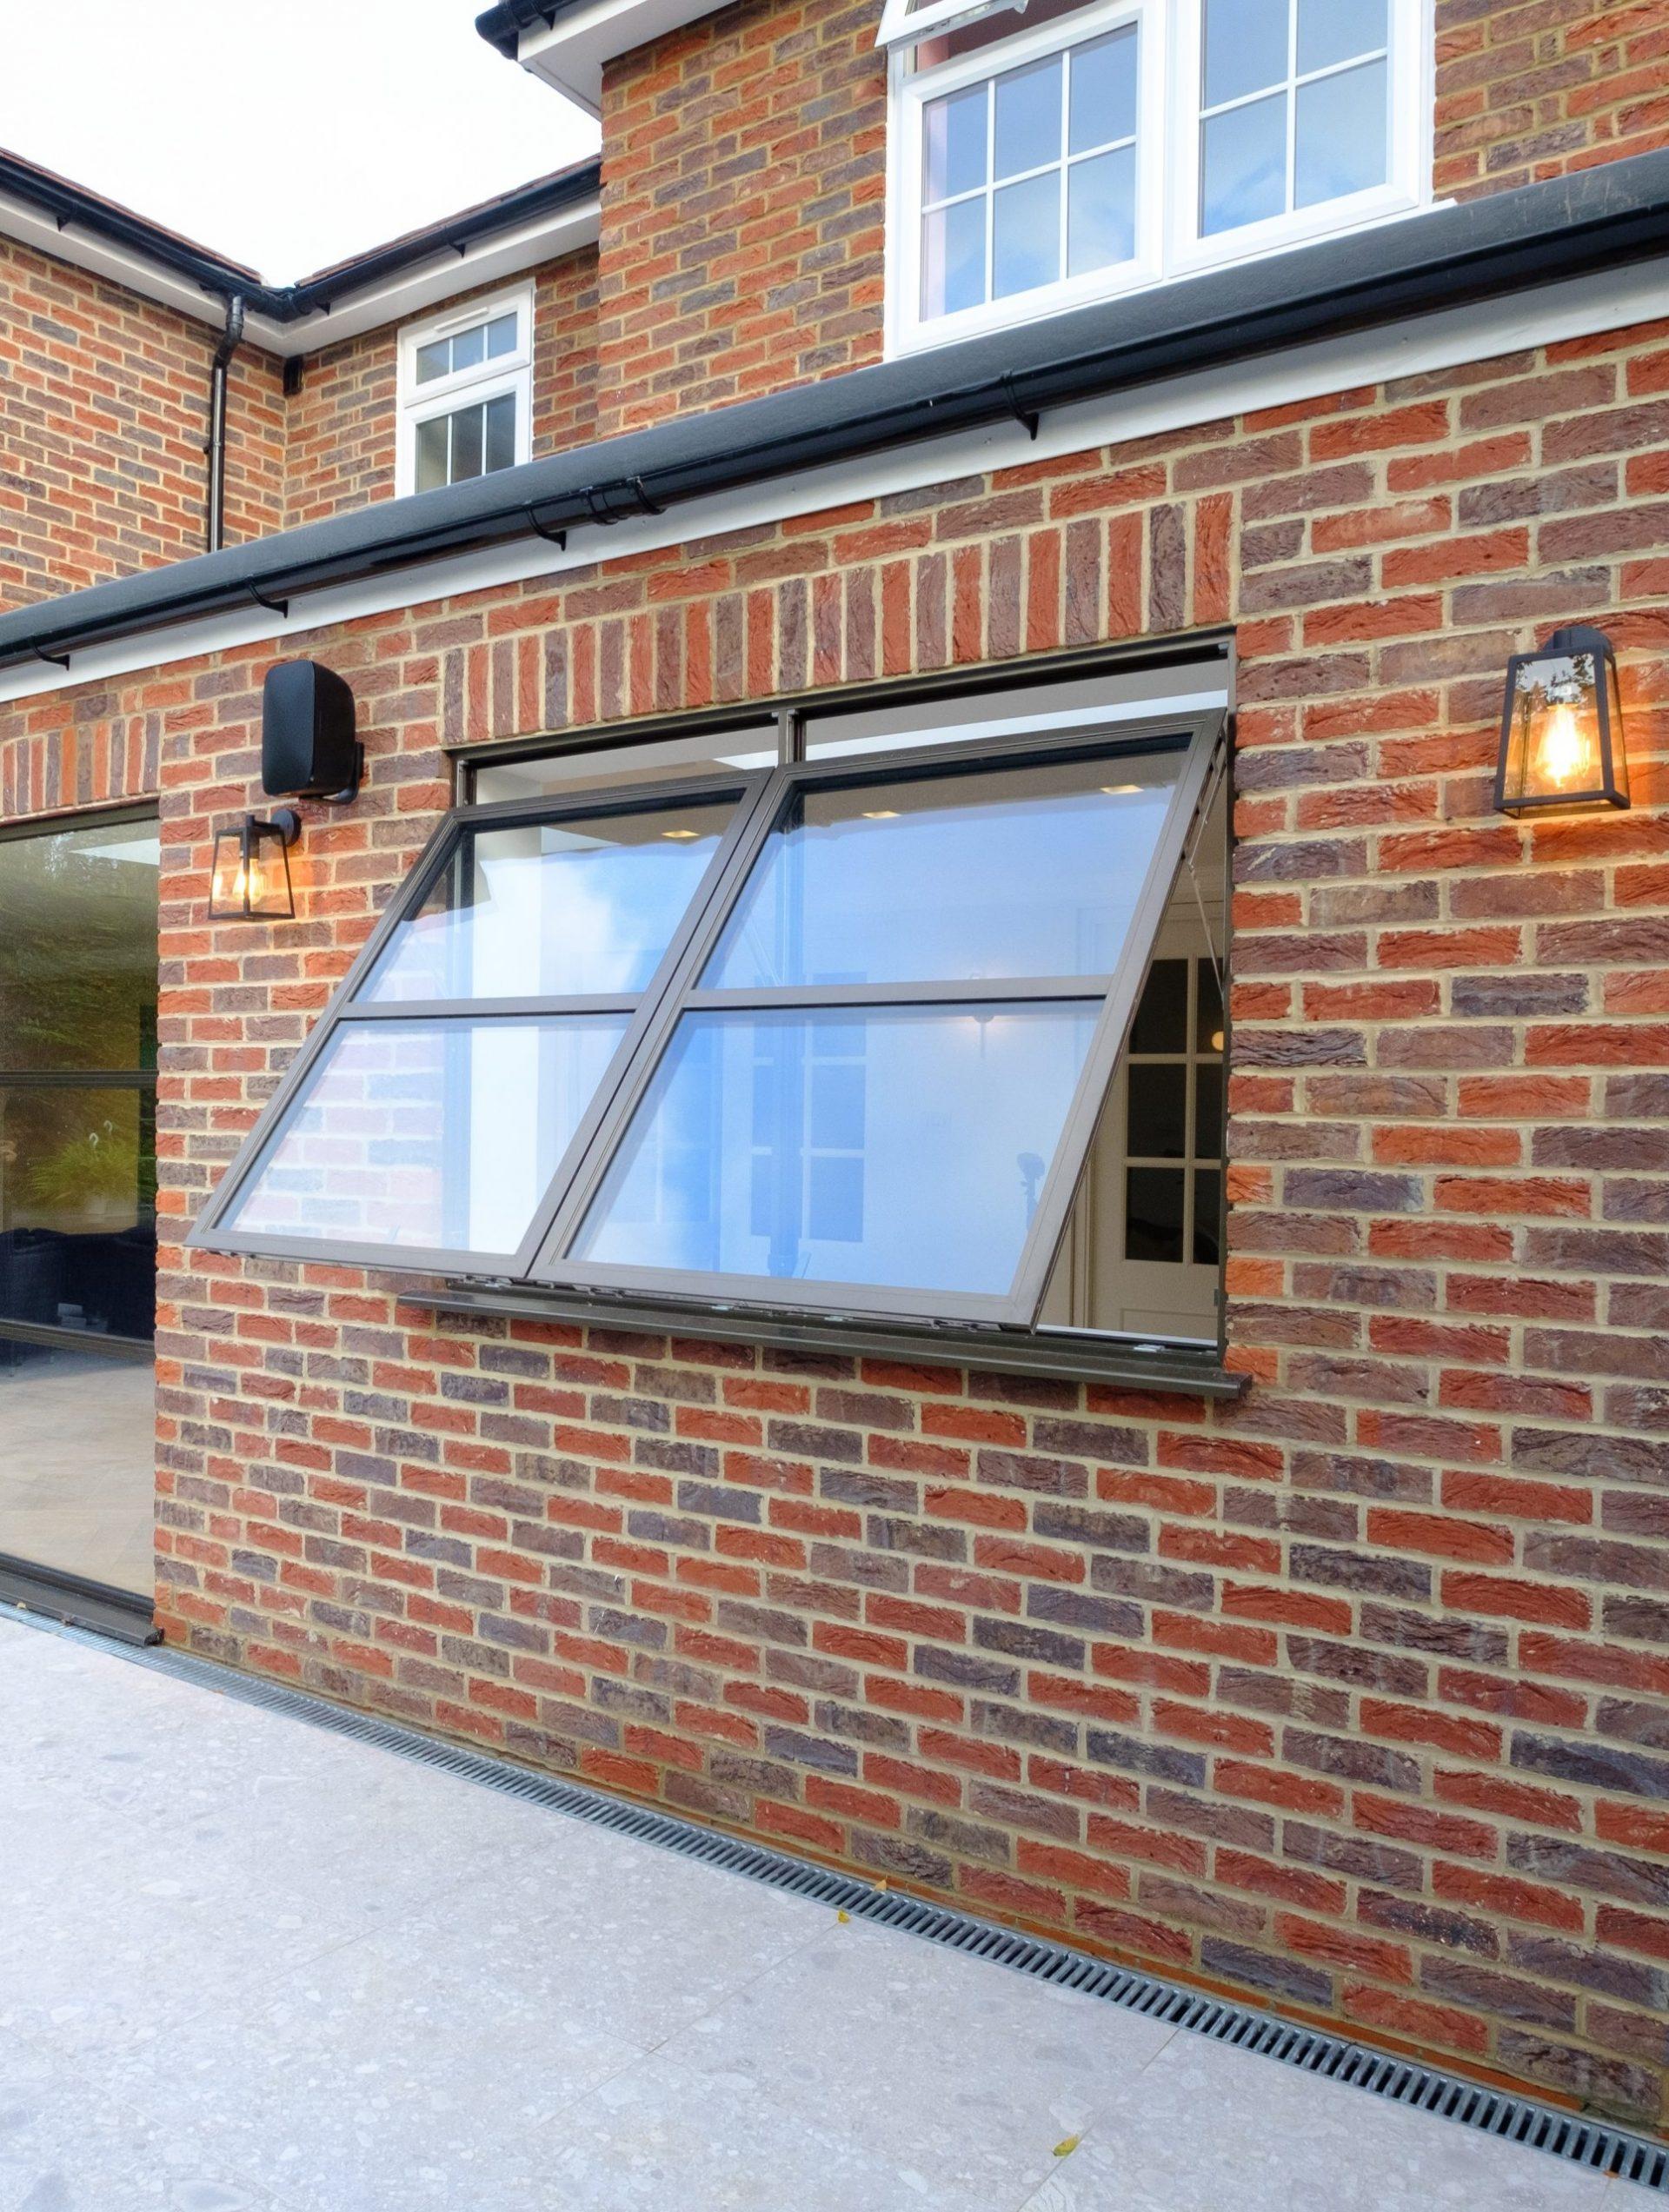 Sieger Legacy Aluminium window, exterior glazing